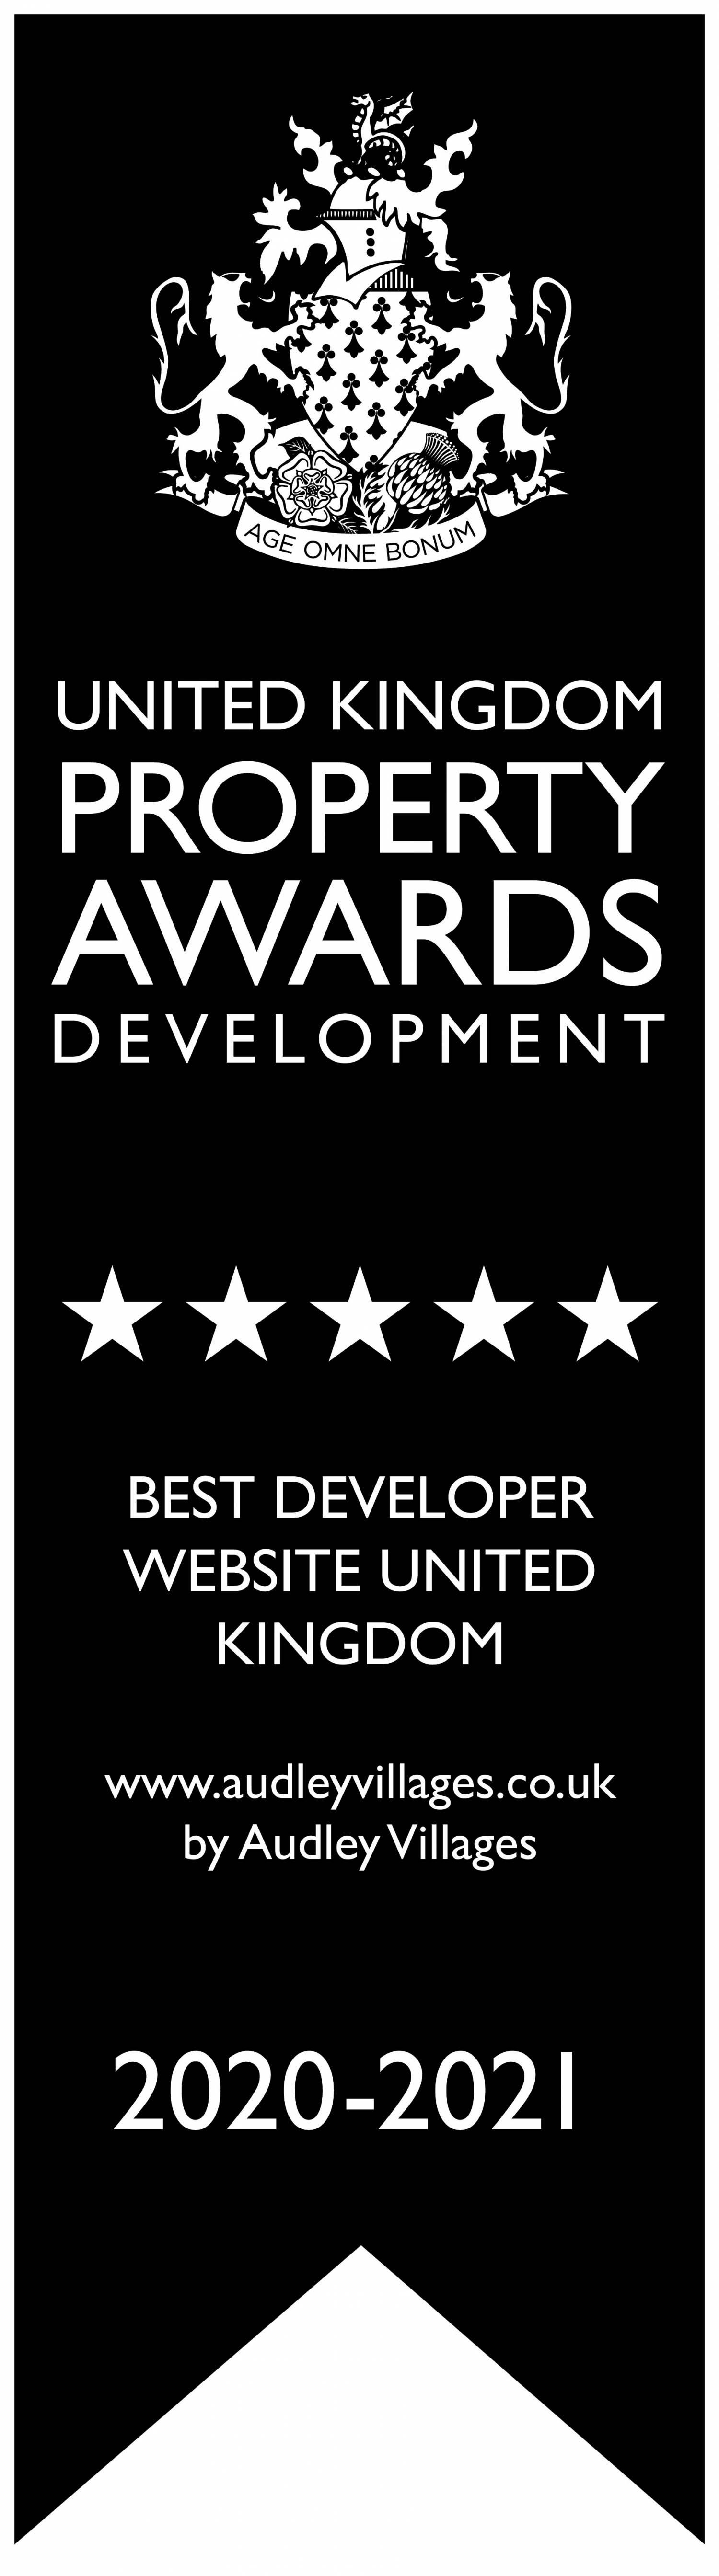 Website award win 2020